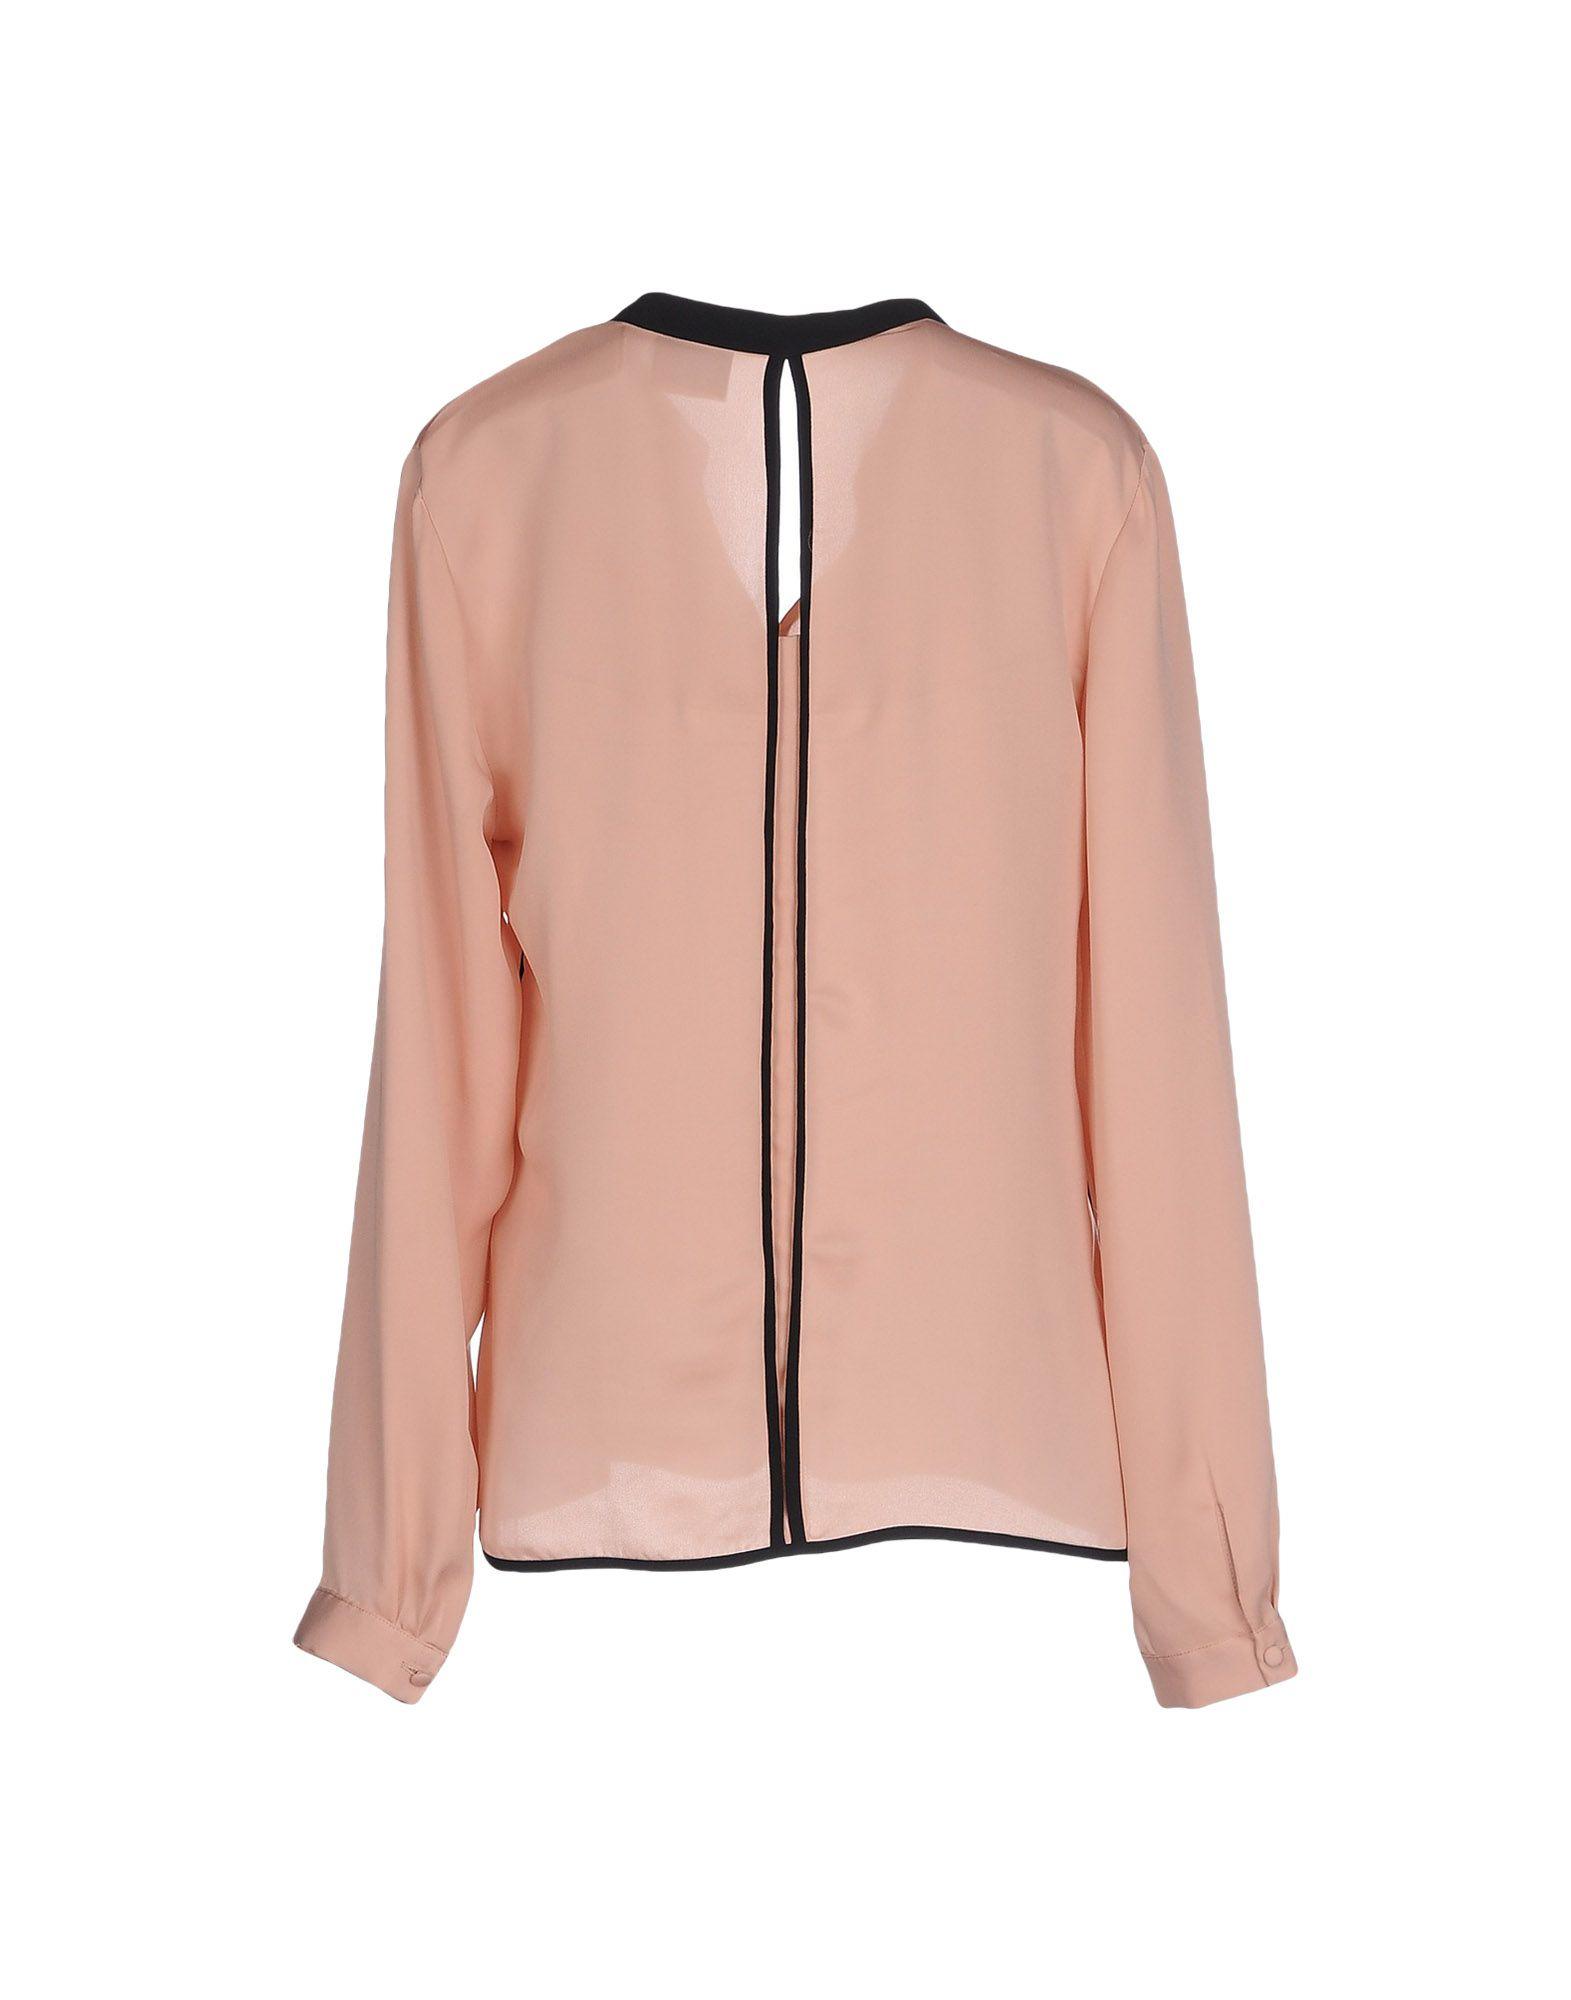 lyst vero moda blouse in pink. Black Bedroom Furniture Sets. Home Design Ideas